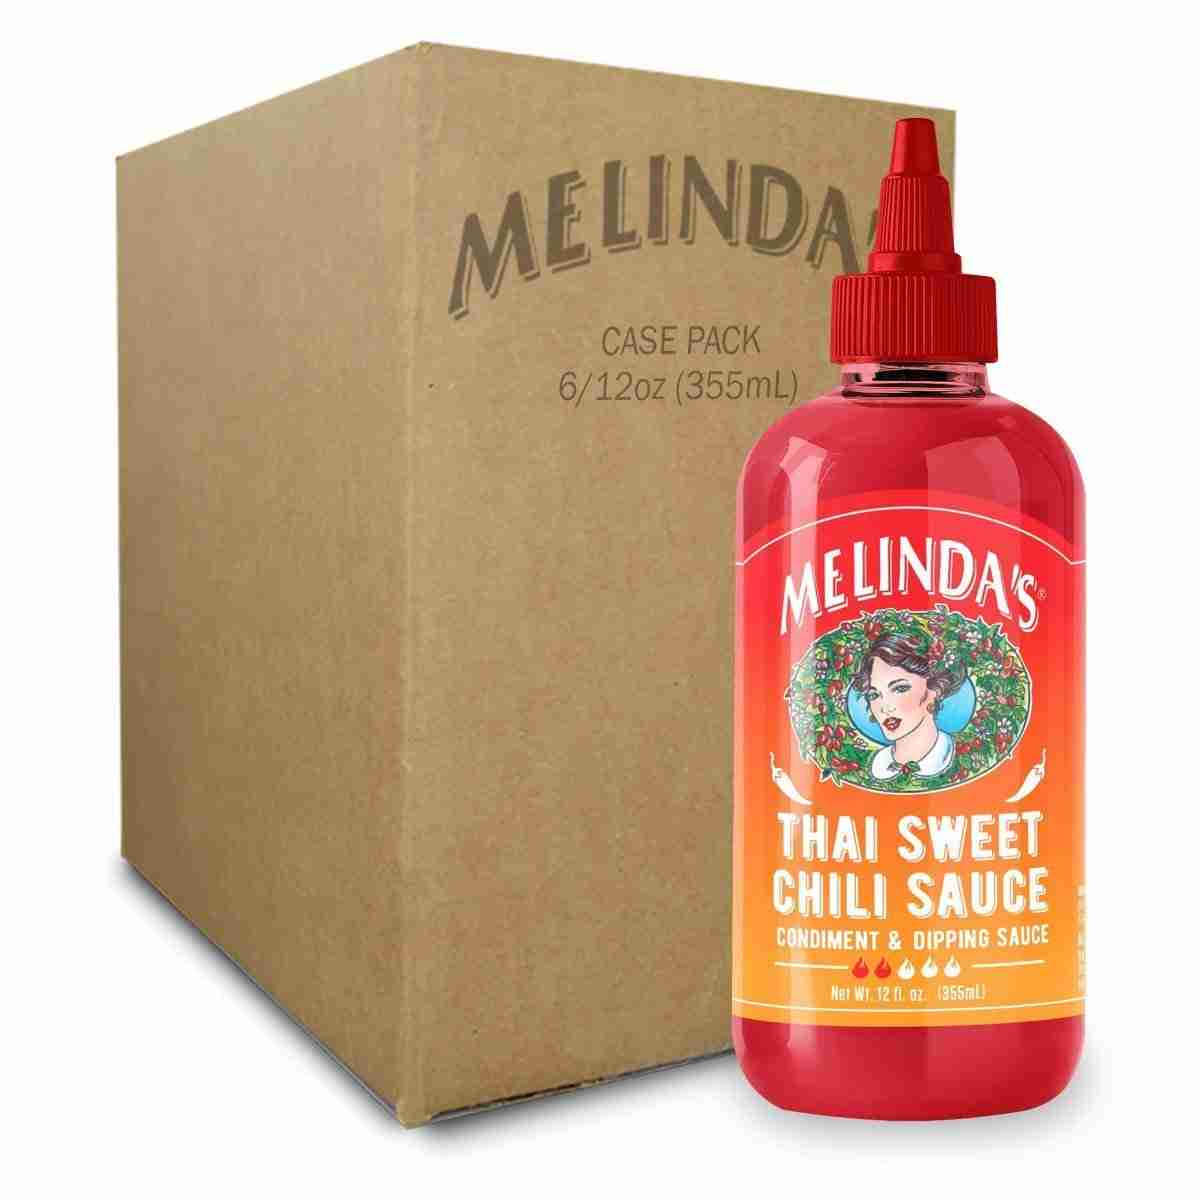 Melinda's Thai Sweet Chili Sauce (6 pk Case)